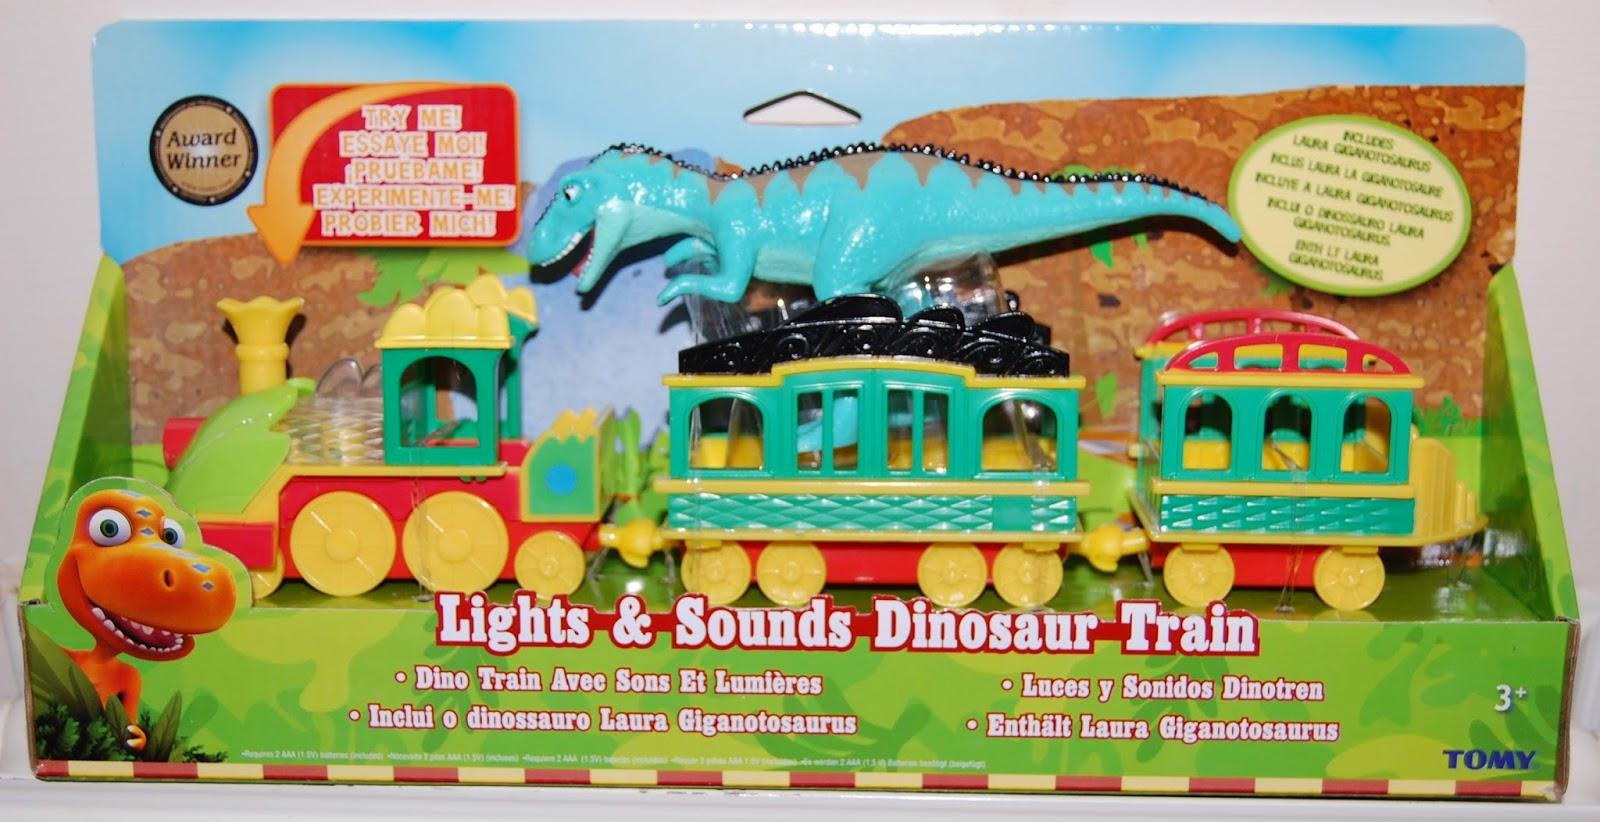 Dinosaur Train Fun - My Three and Me